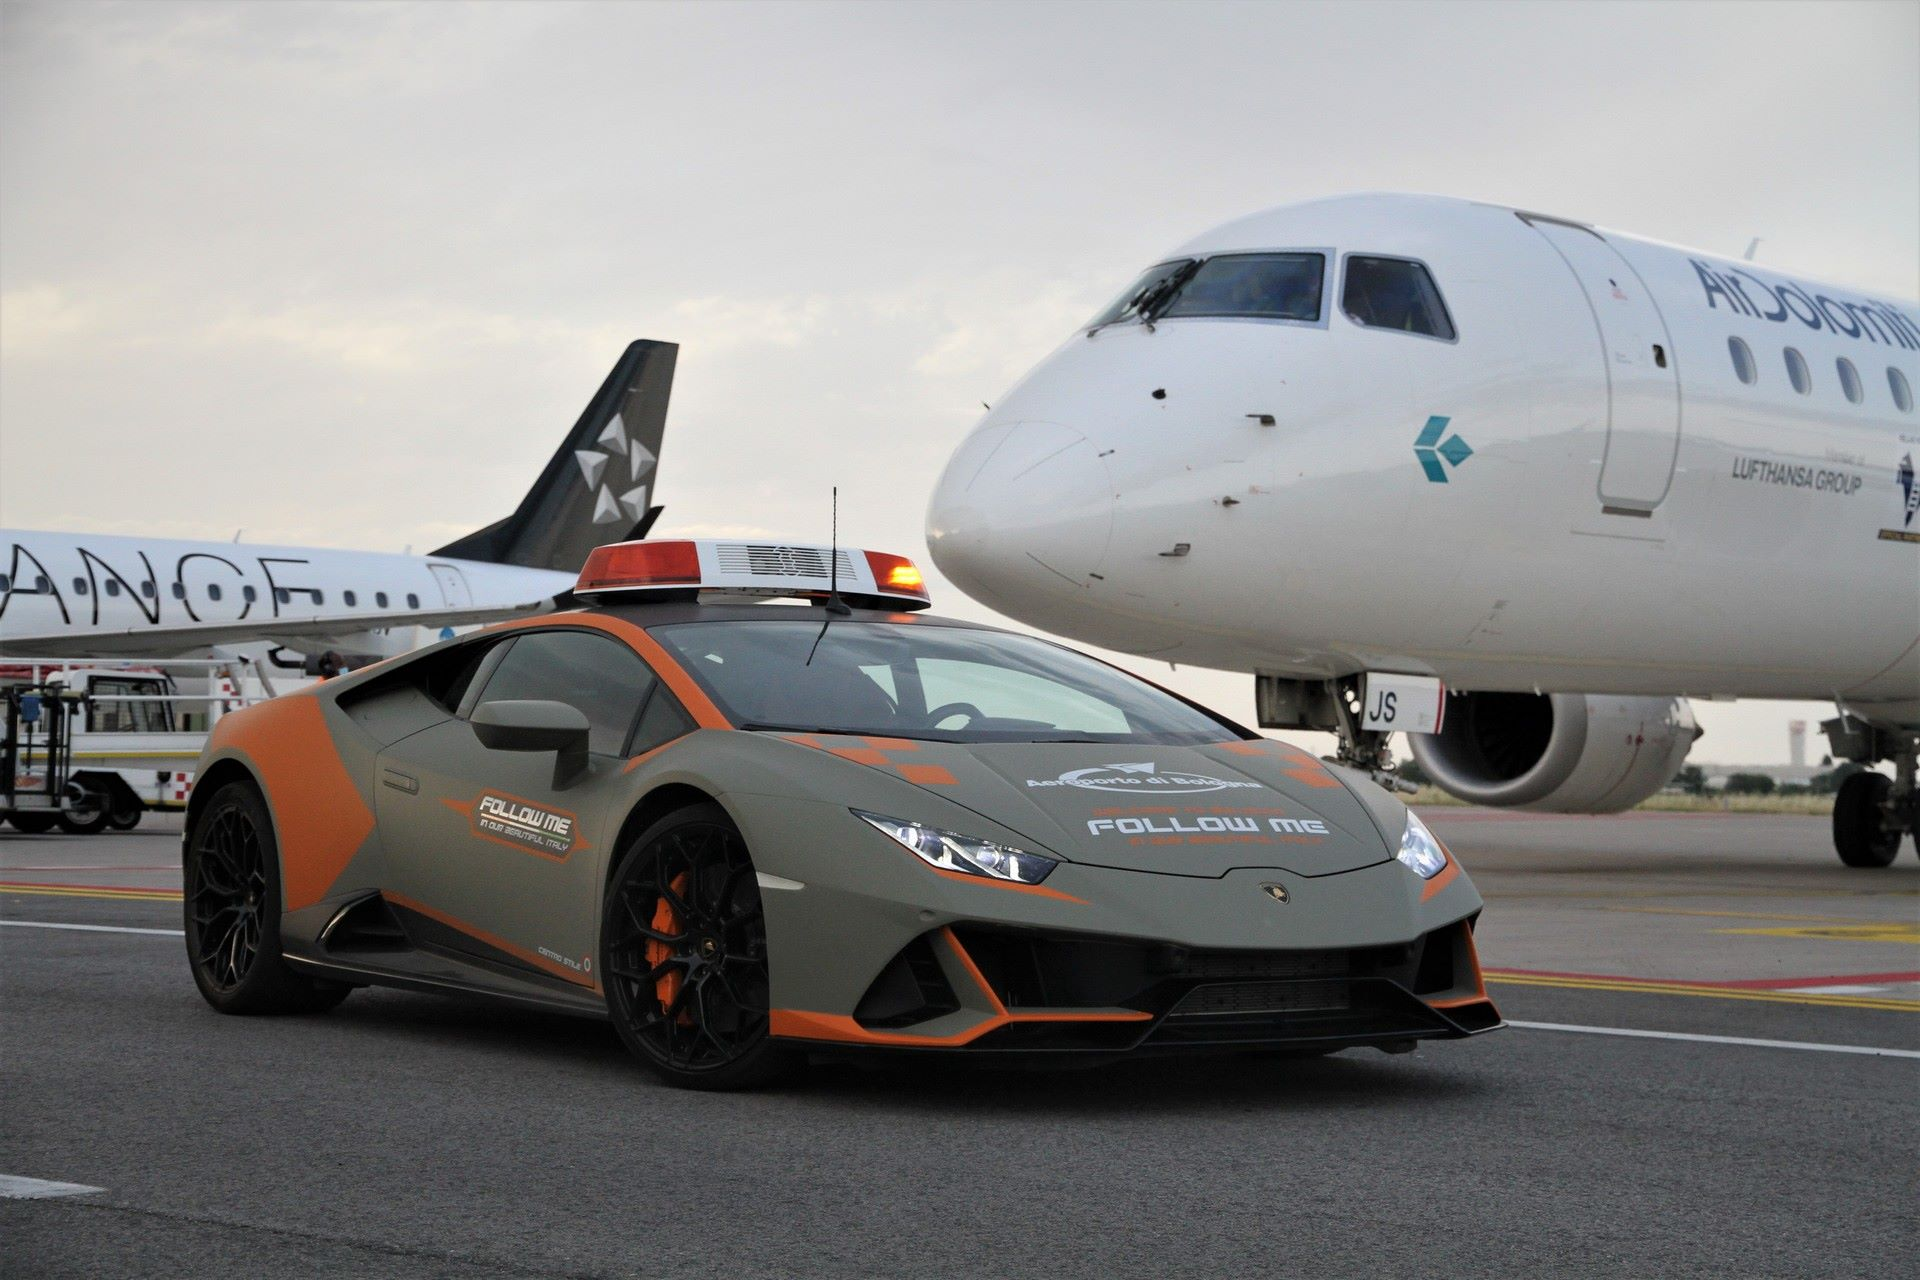 Lamborghini-Huracan-Evo-Follow-Me-bologna-airport-2021-4